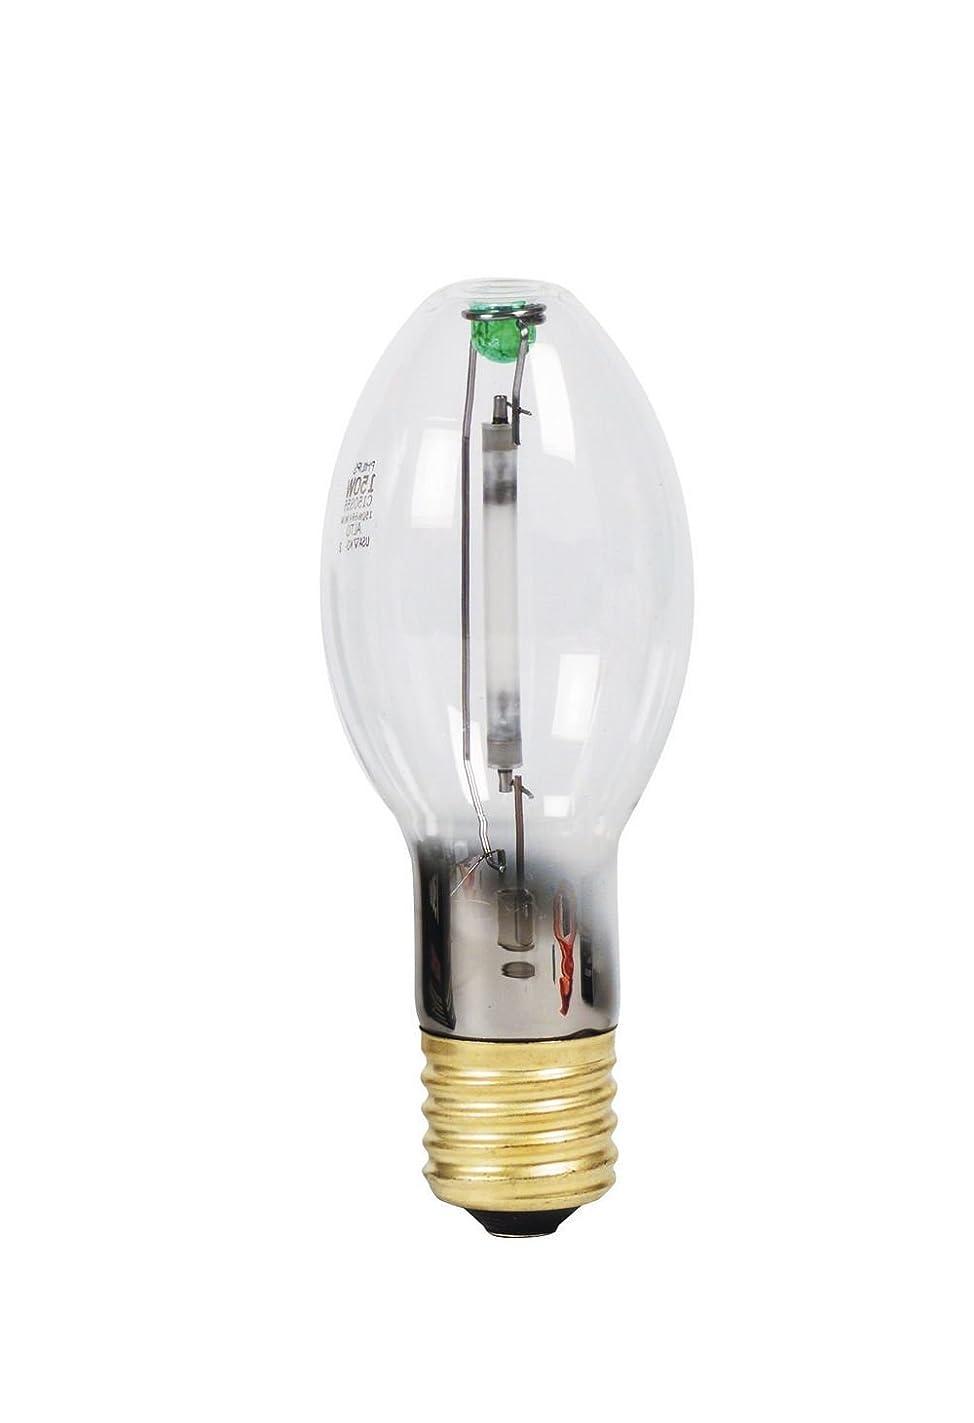 Philips 140961 High Intensity Discharge High Pressure Sodium 150-Watt ED23-1/2 Mogul Base Light Bulb